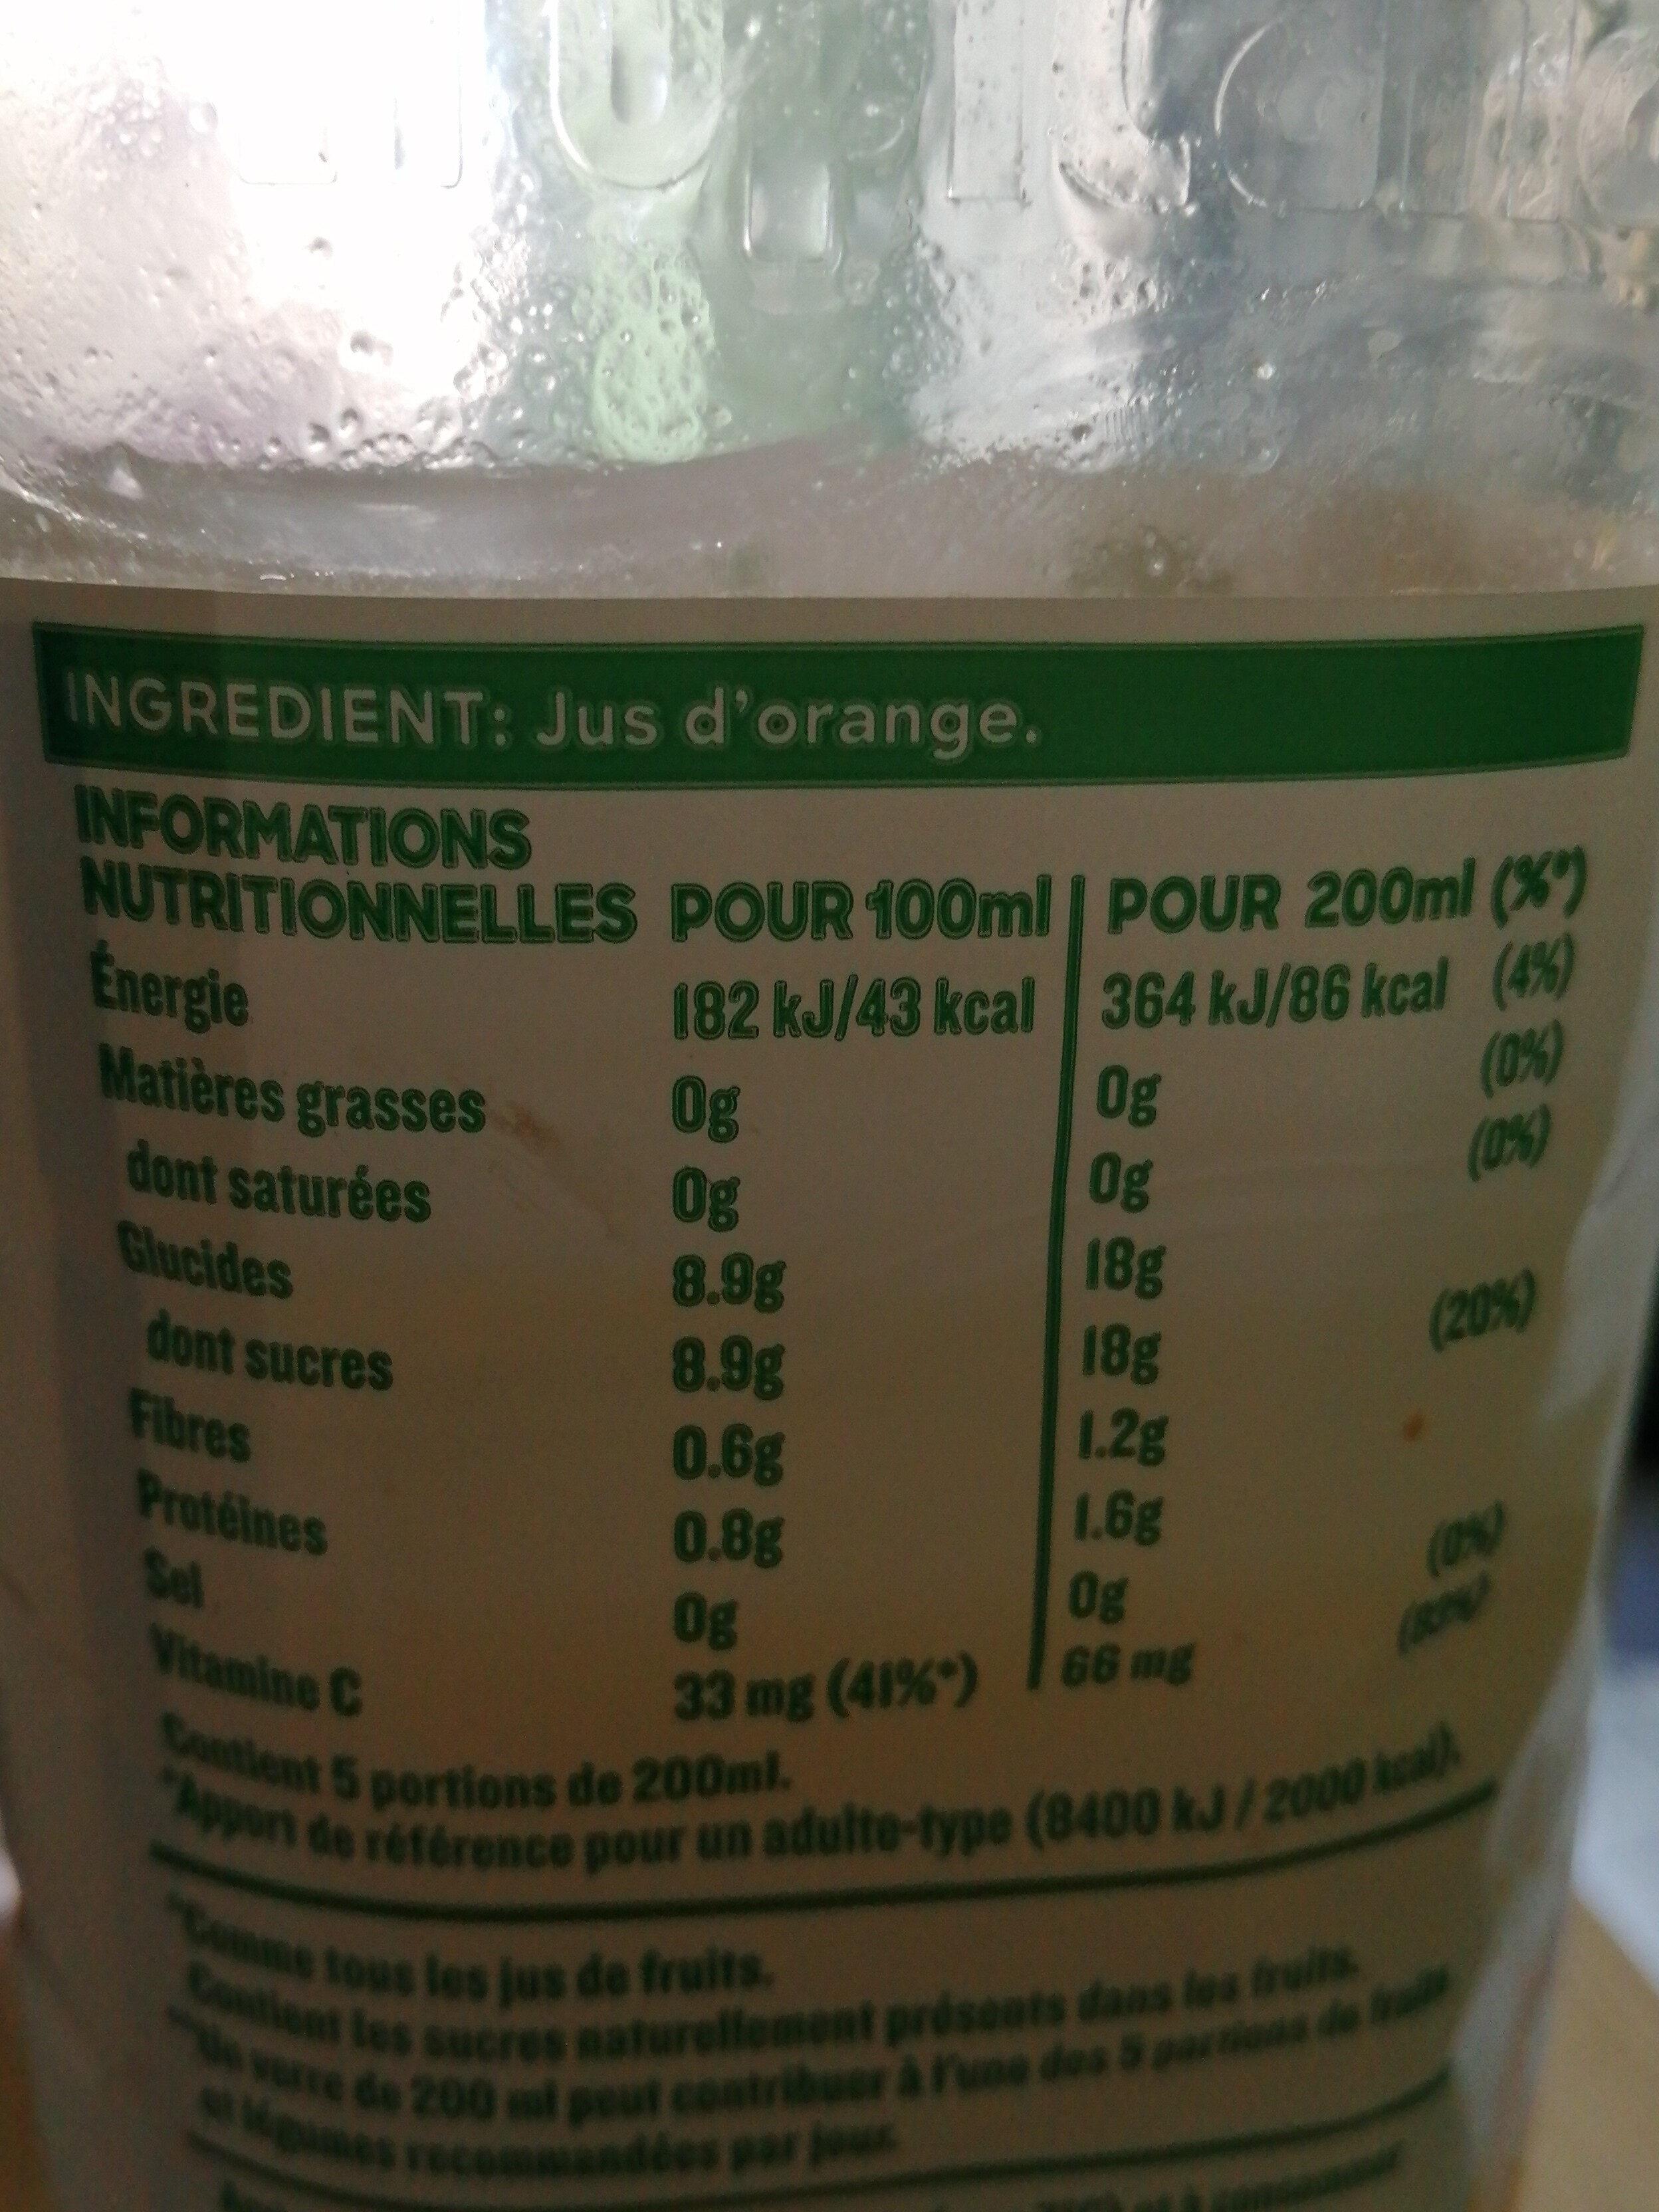 tropicana orange sans pulpe - Ingredients